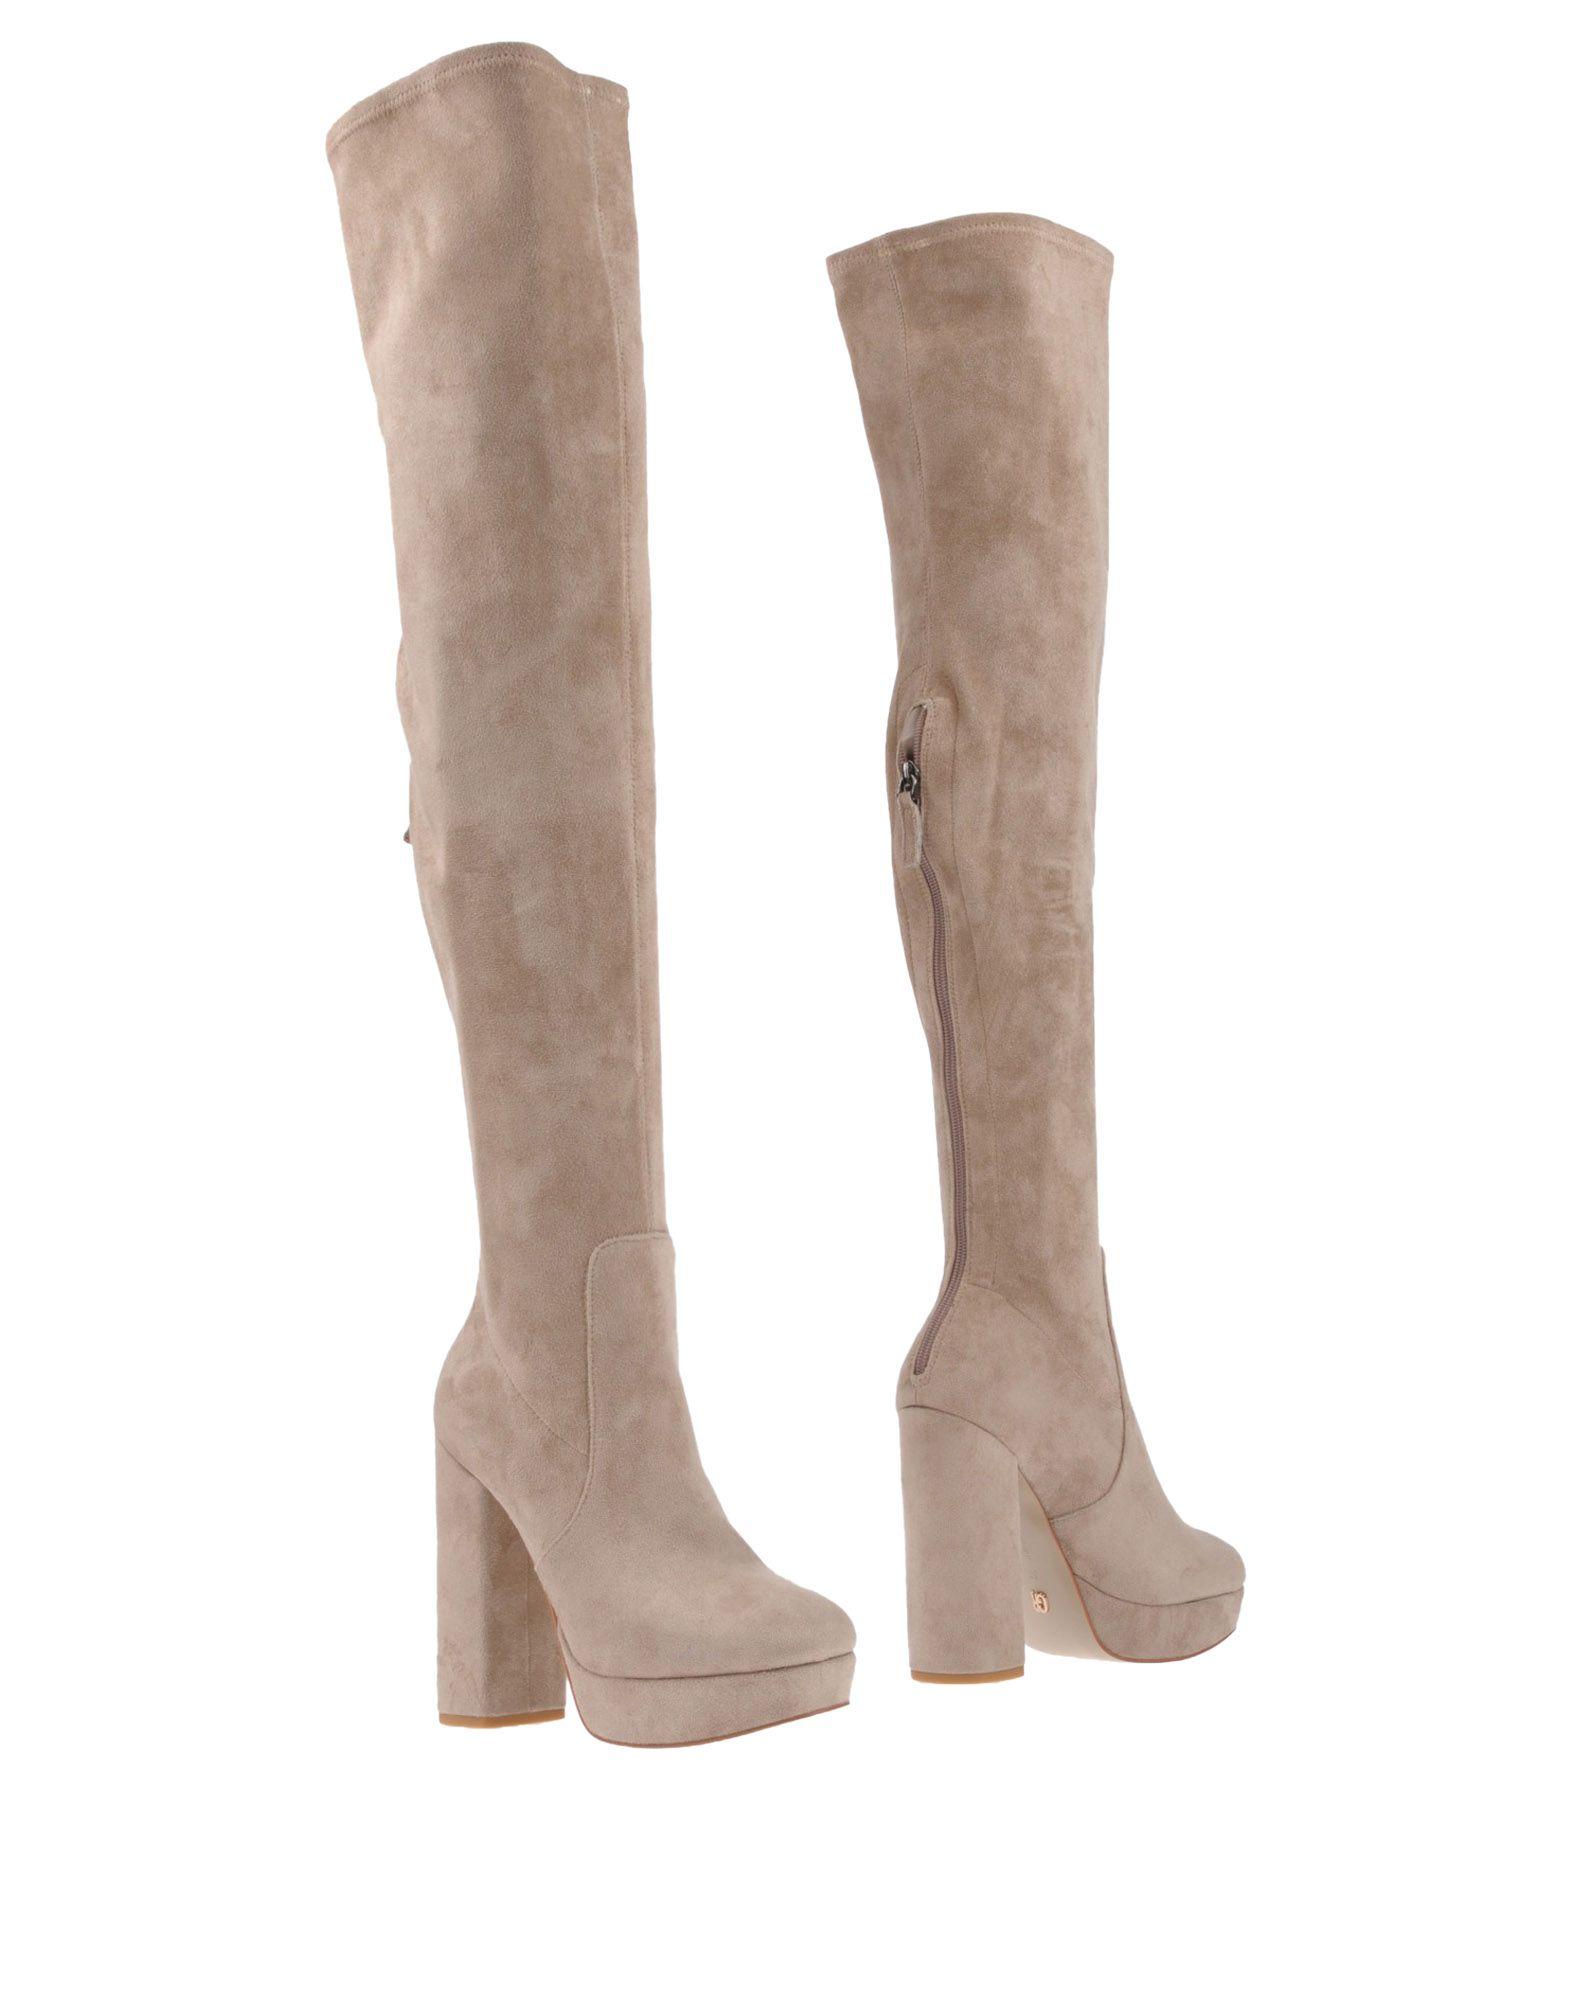 Gianni Renzi®  Couture Boots - Couture Women Gianni Renzi®  Couture - Boots online on  Australia - 11455169GS 4c0def